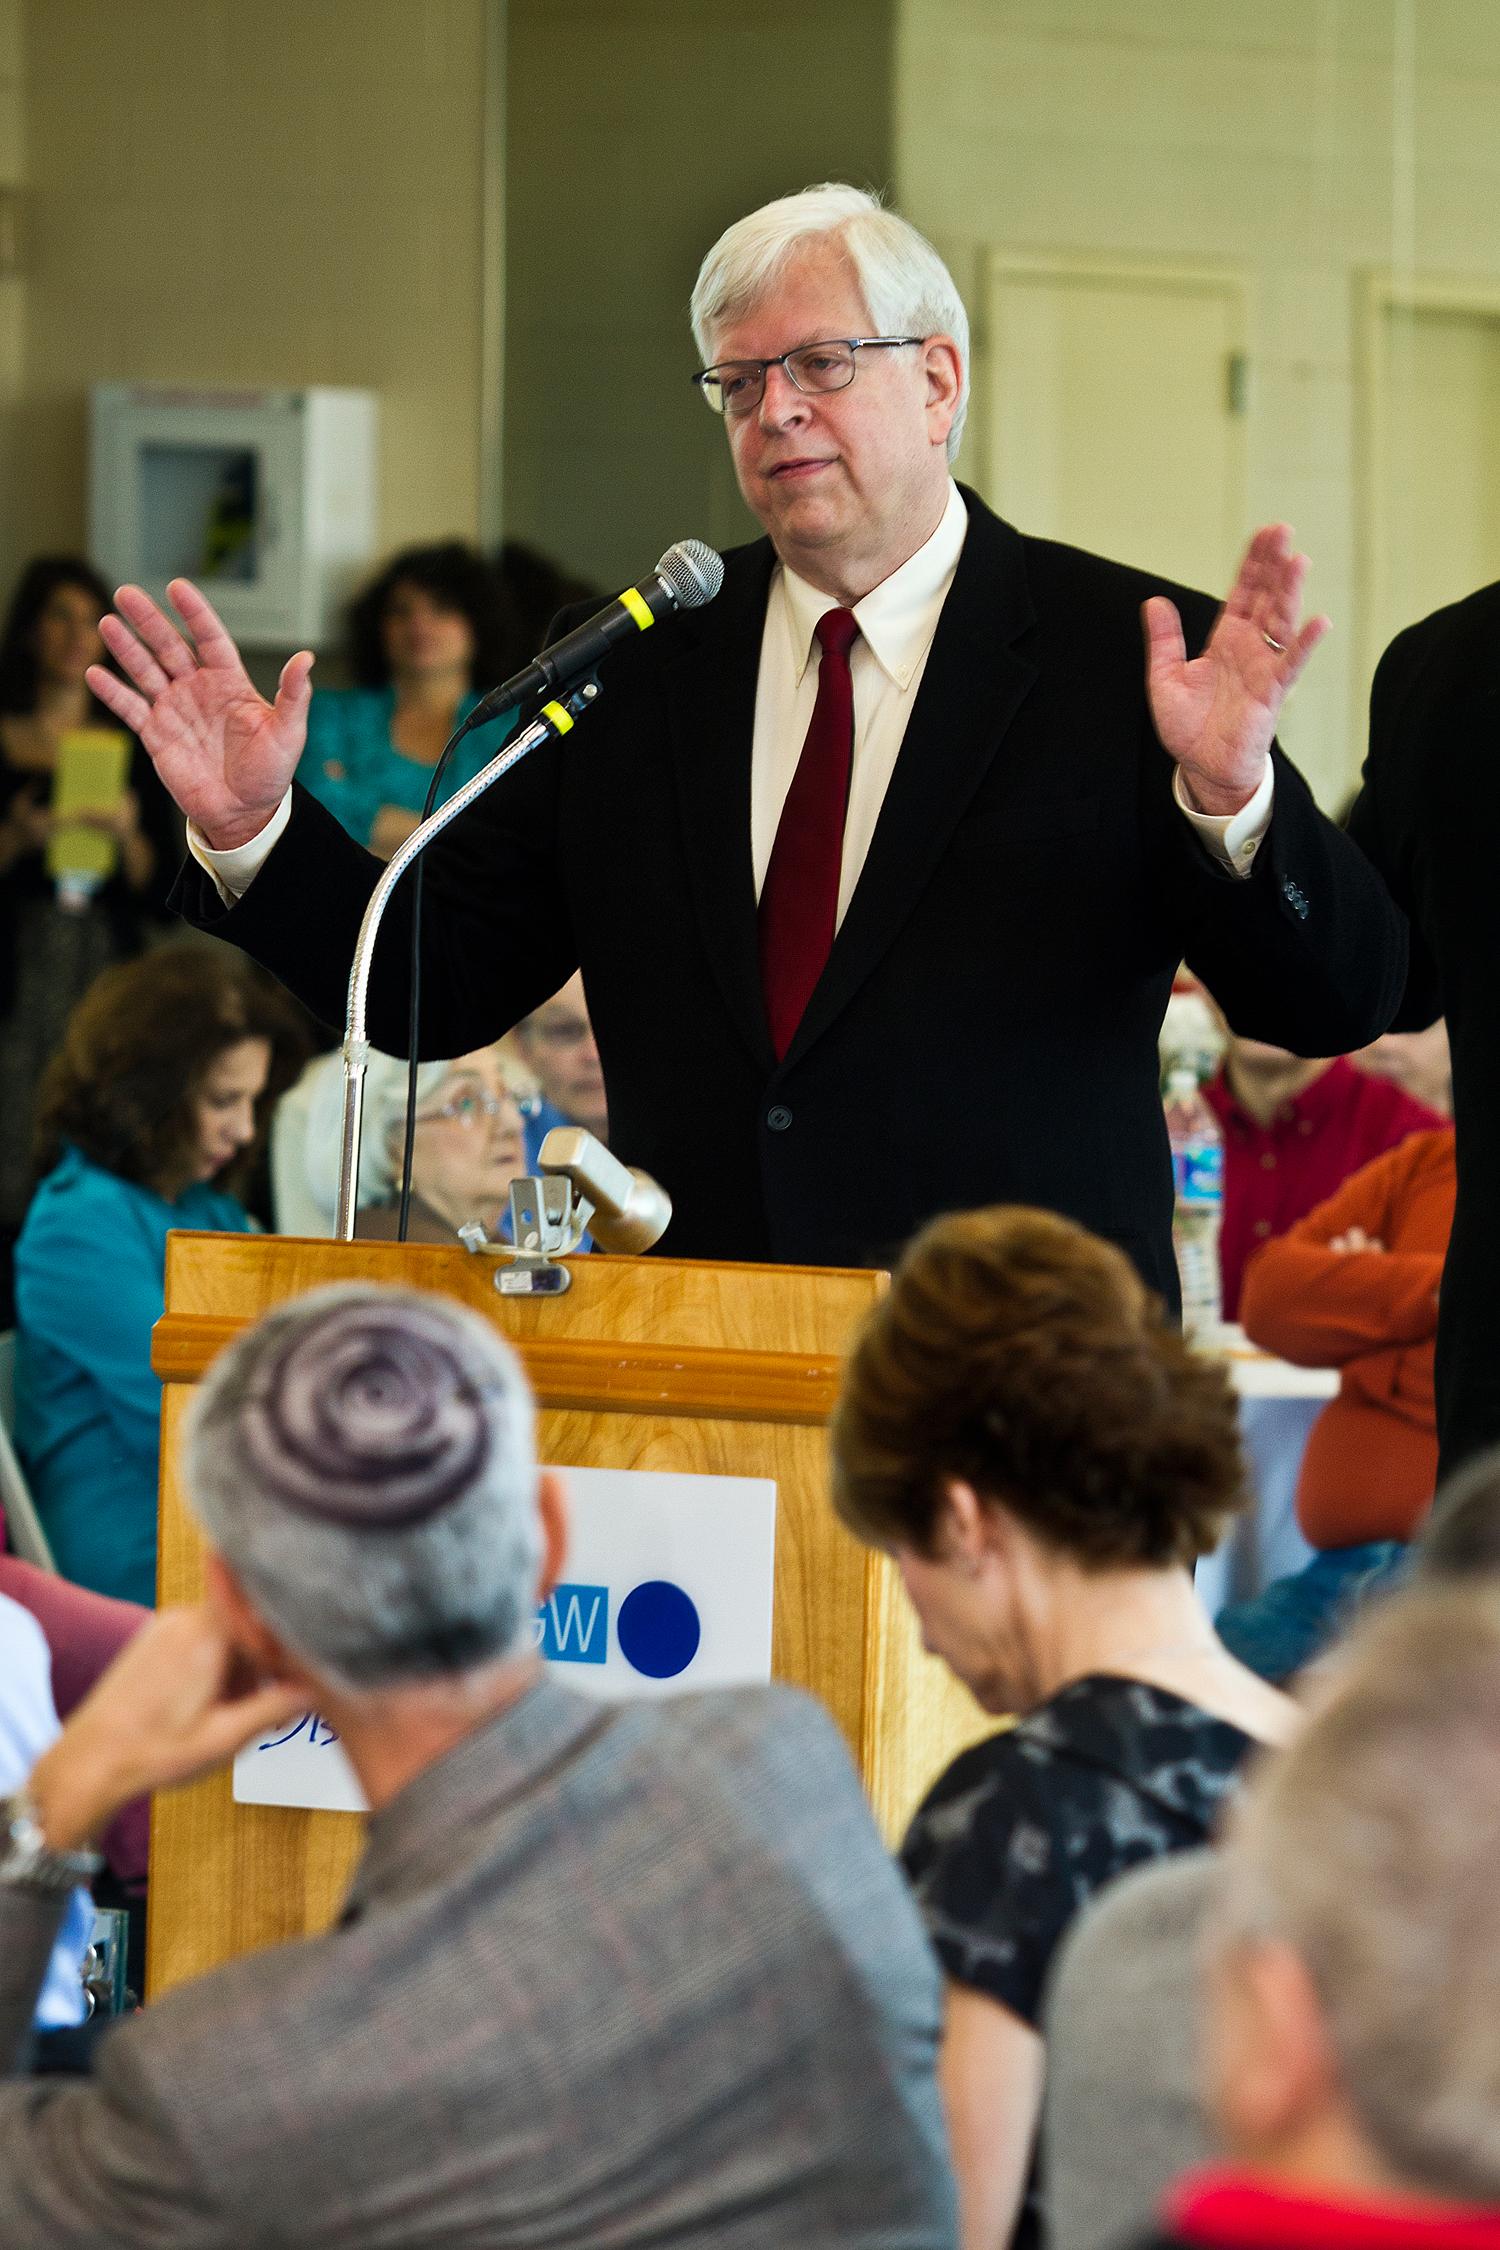 Conservative Talk Show Host Dennis Prager